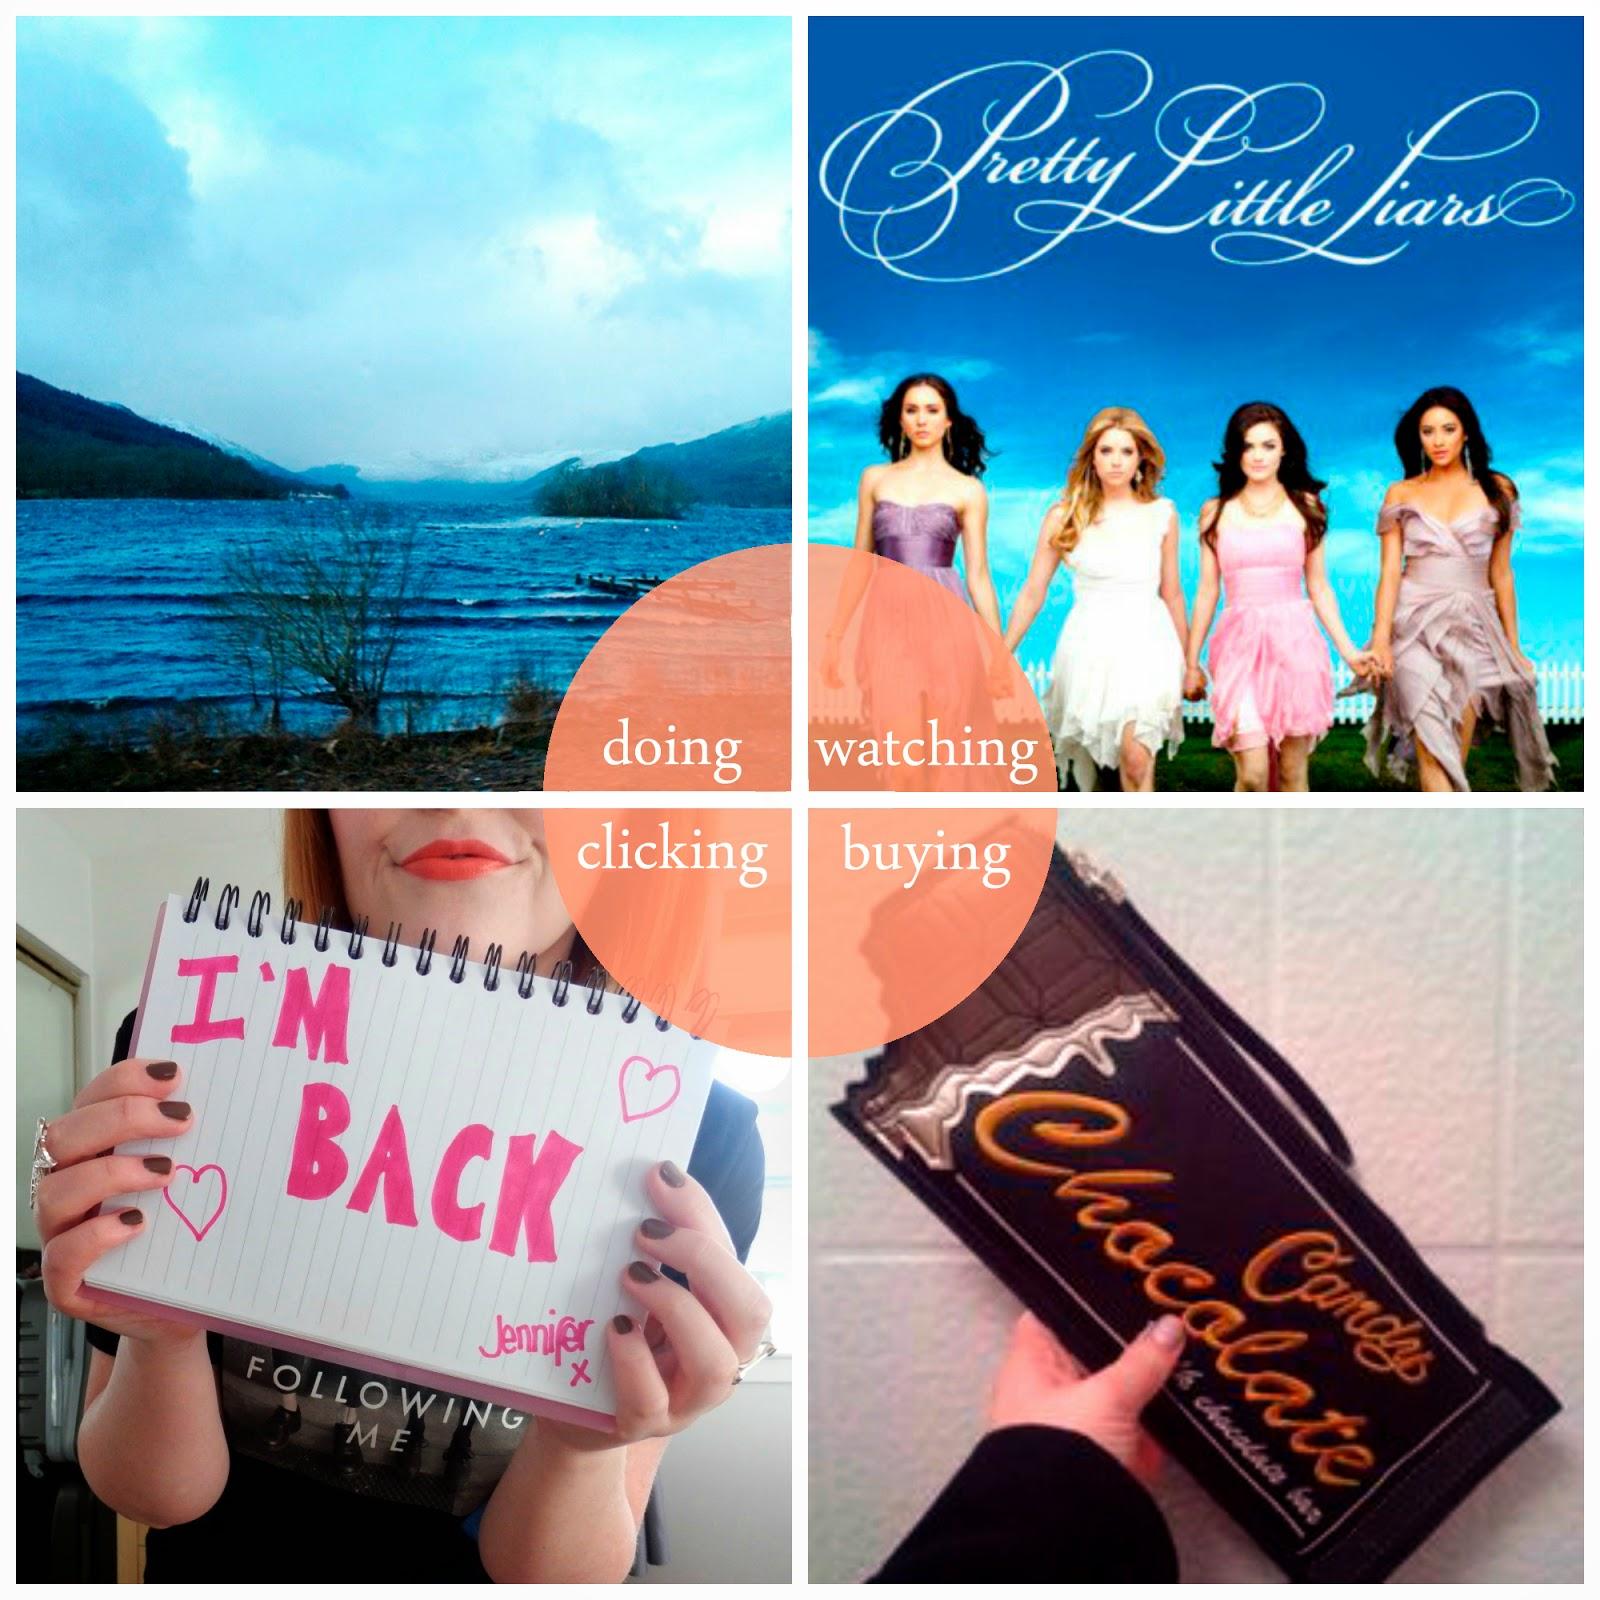 Round Up, January, January highlights, Oban, Pretty Little Liars, New Look chocolate bar bag, Glasgow Fashion Girl